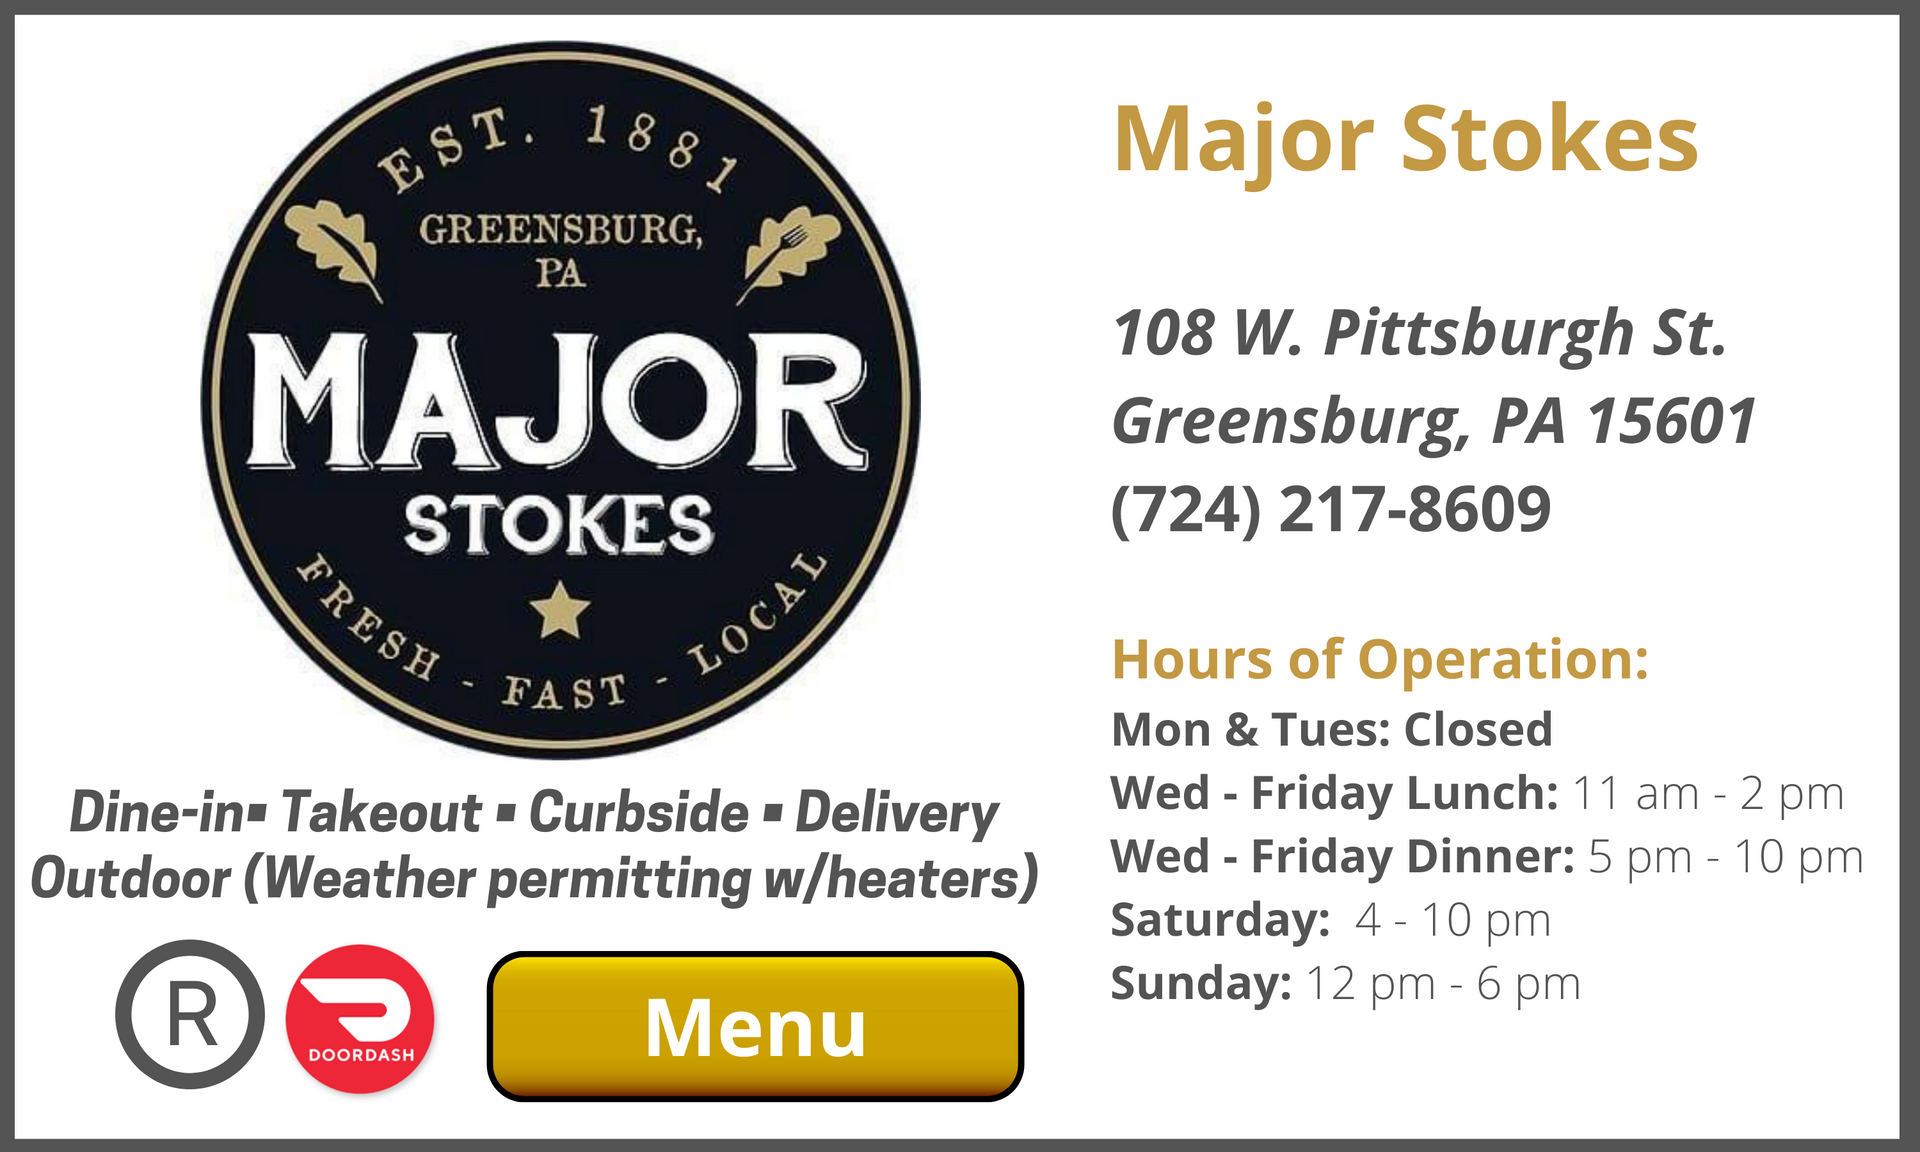 Major Stokes